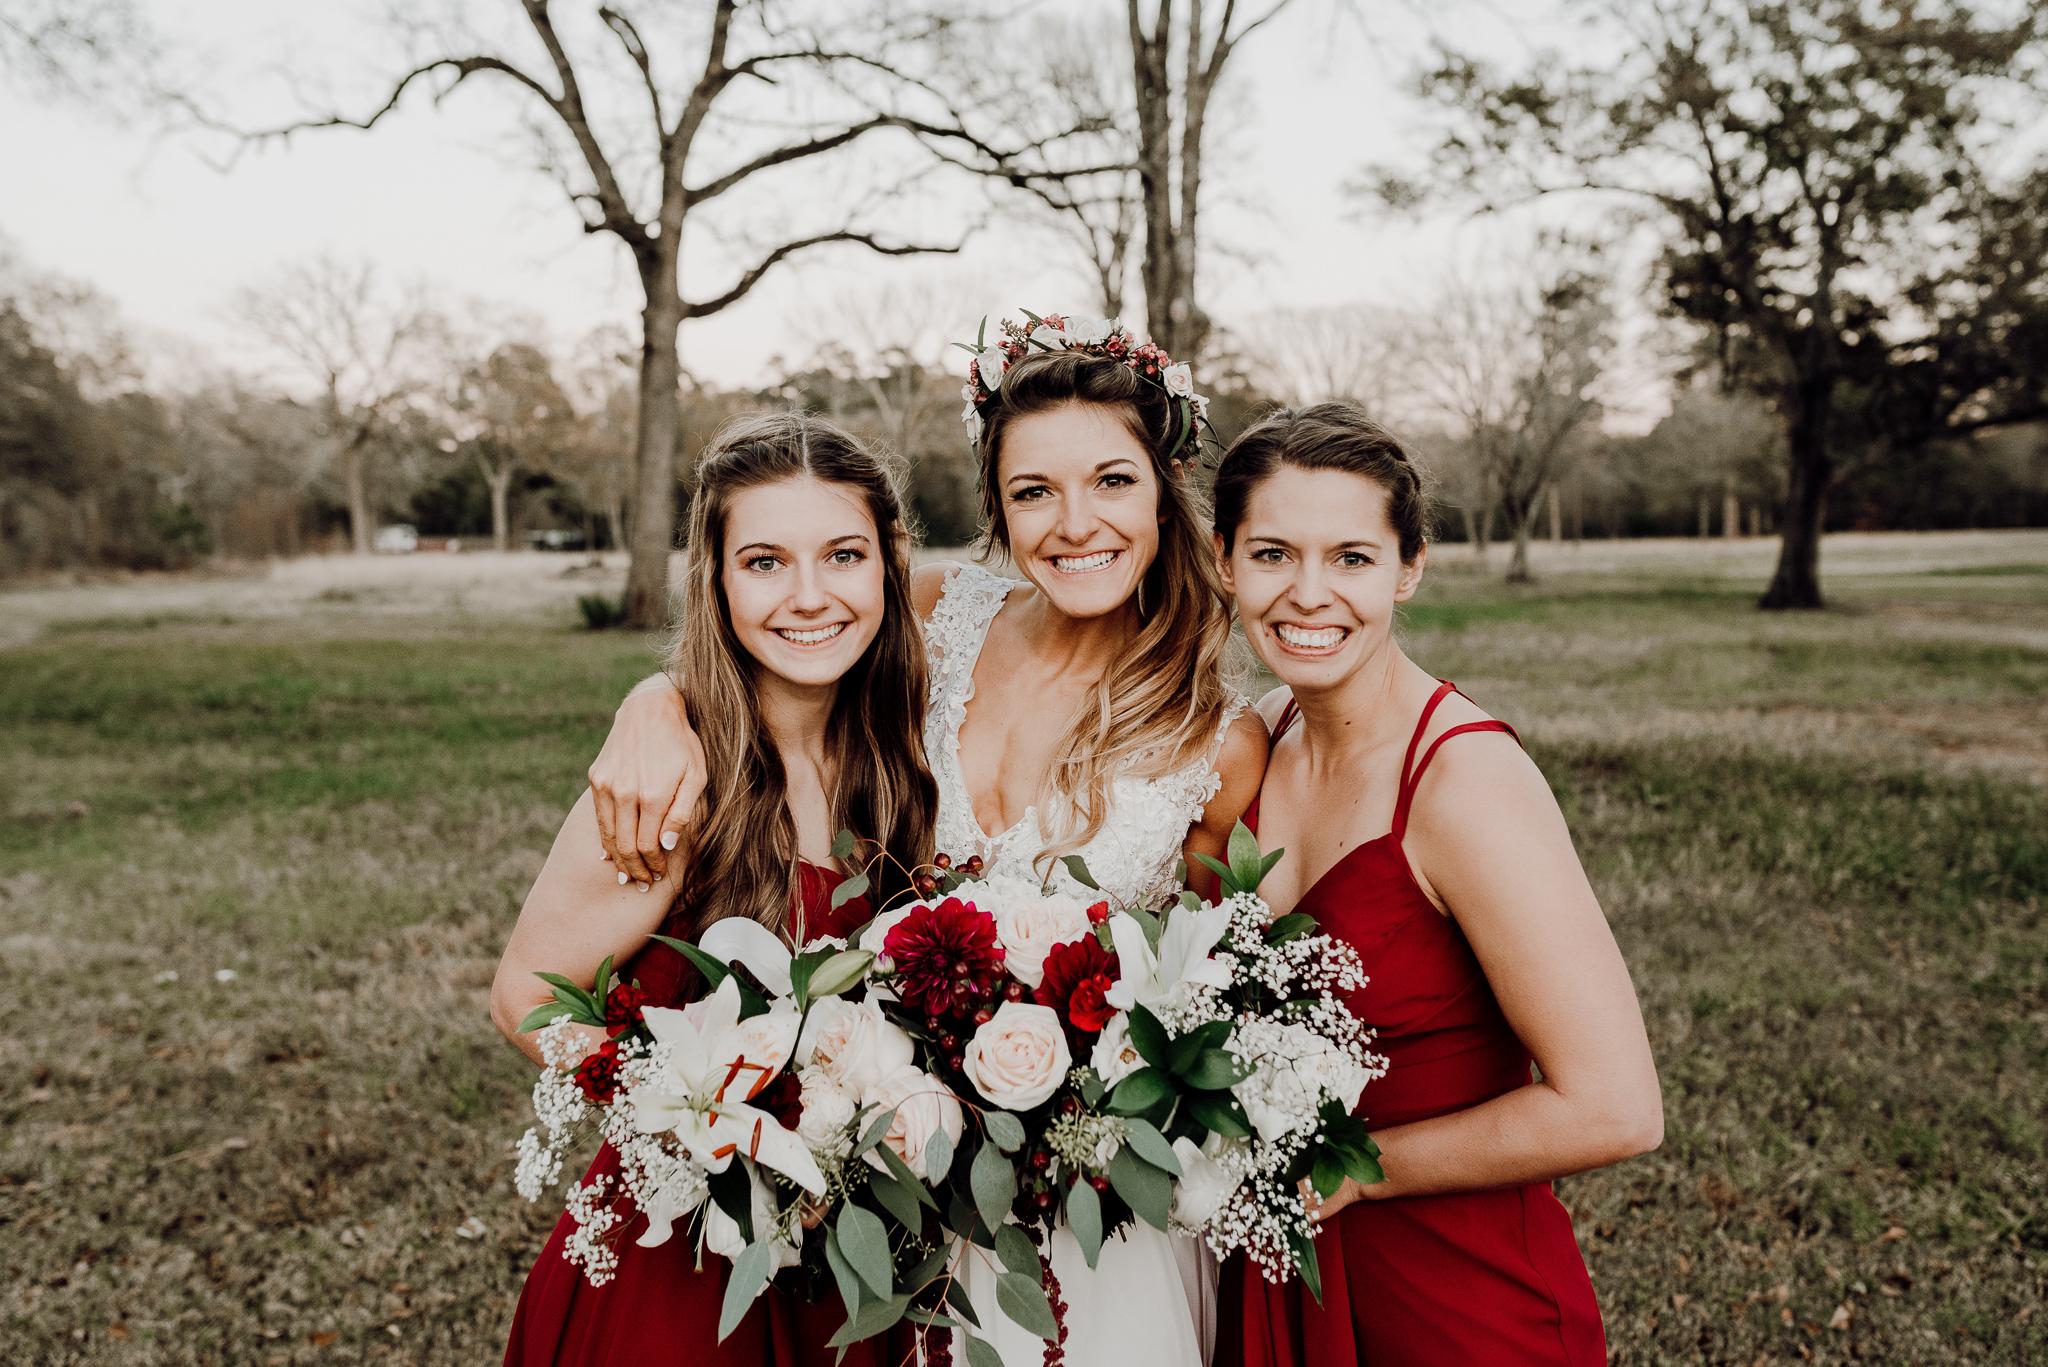 Michelle + Aron-Houston Wedding Photographer-Magnolia Meadows-Winter Wedding | Kristen Giles Photography - 076.jpg